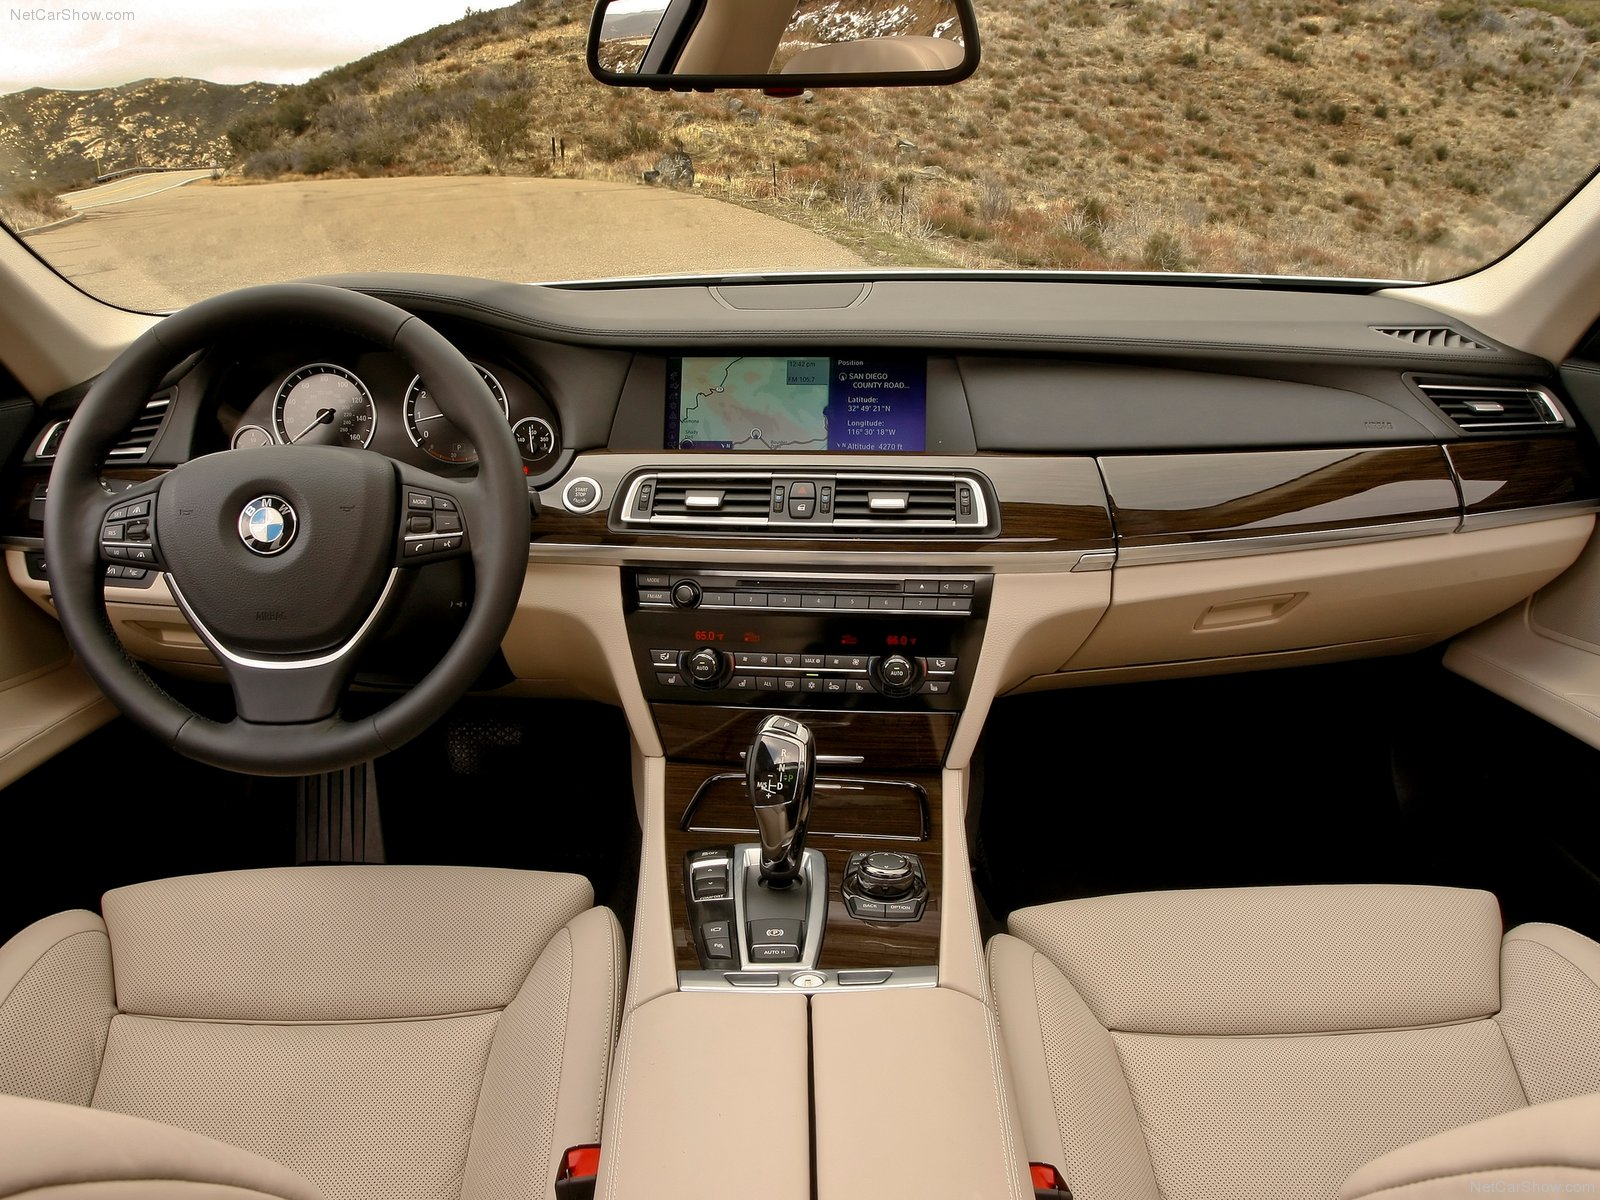 BMW 7 Series F01 F02 Photos